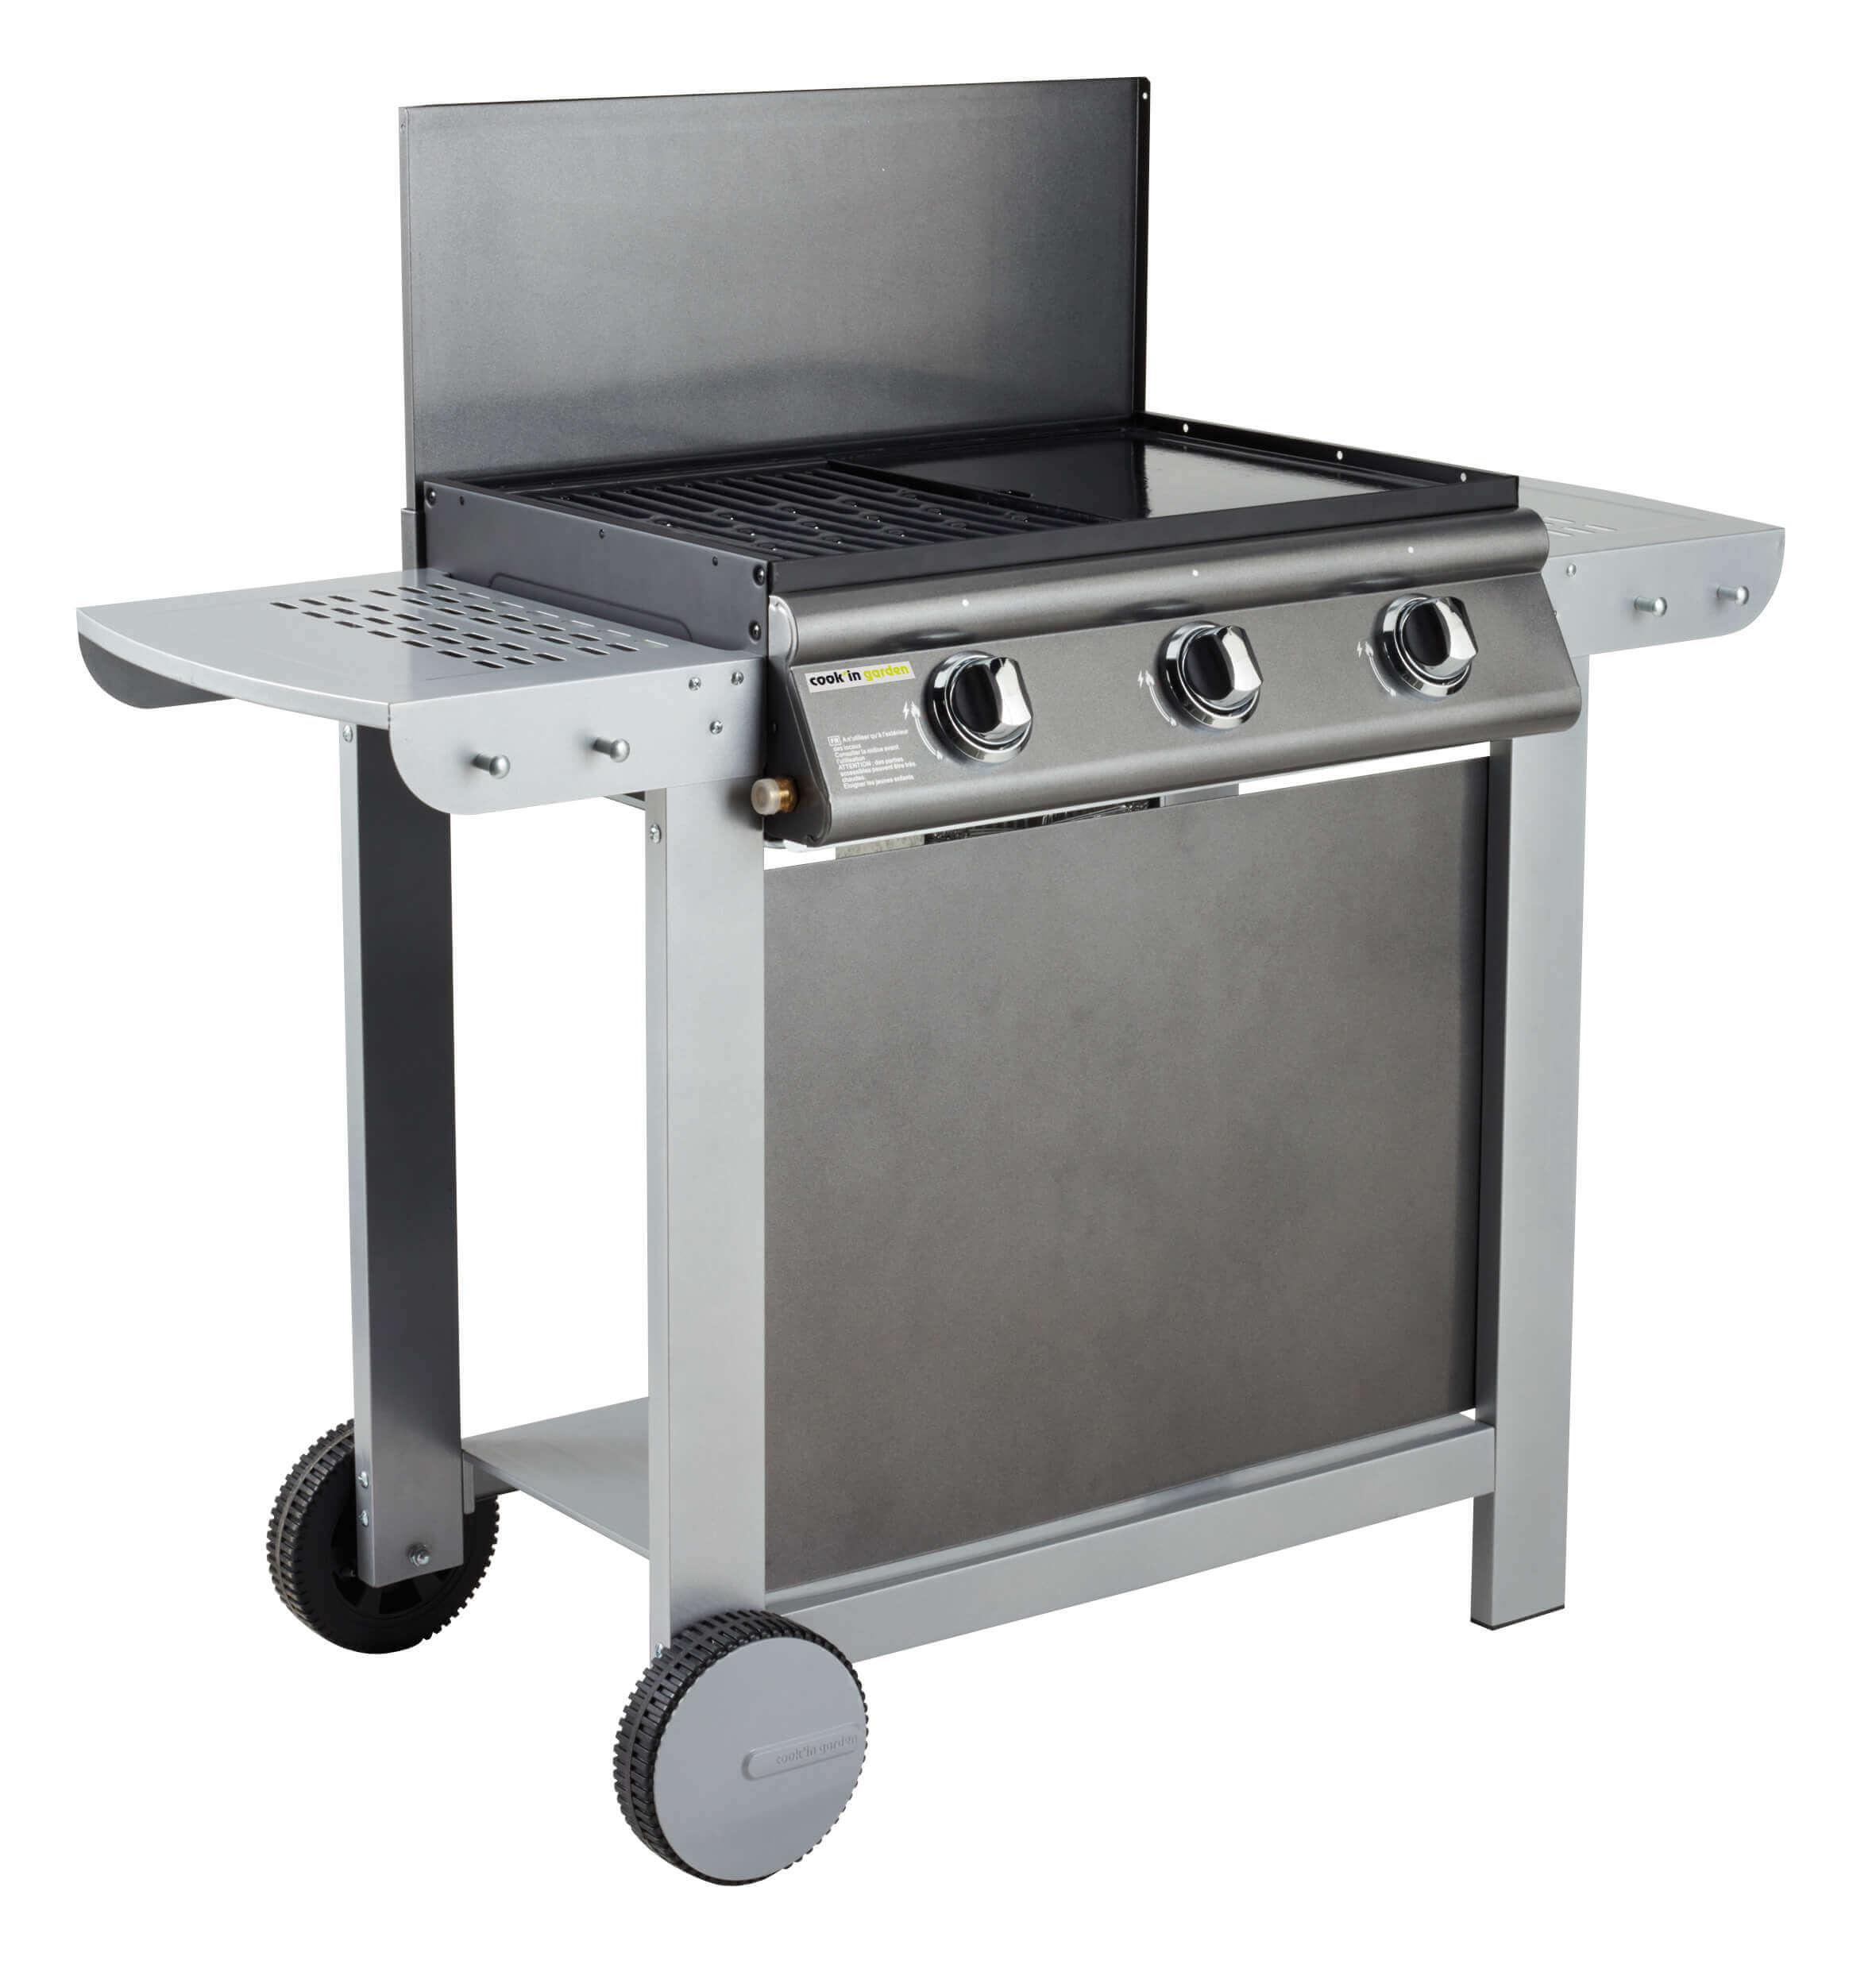 Barbecue Gaz Et Plancha barbecue-plancha gaz puerta luna - 3 brûleurs